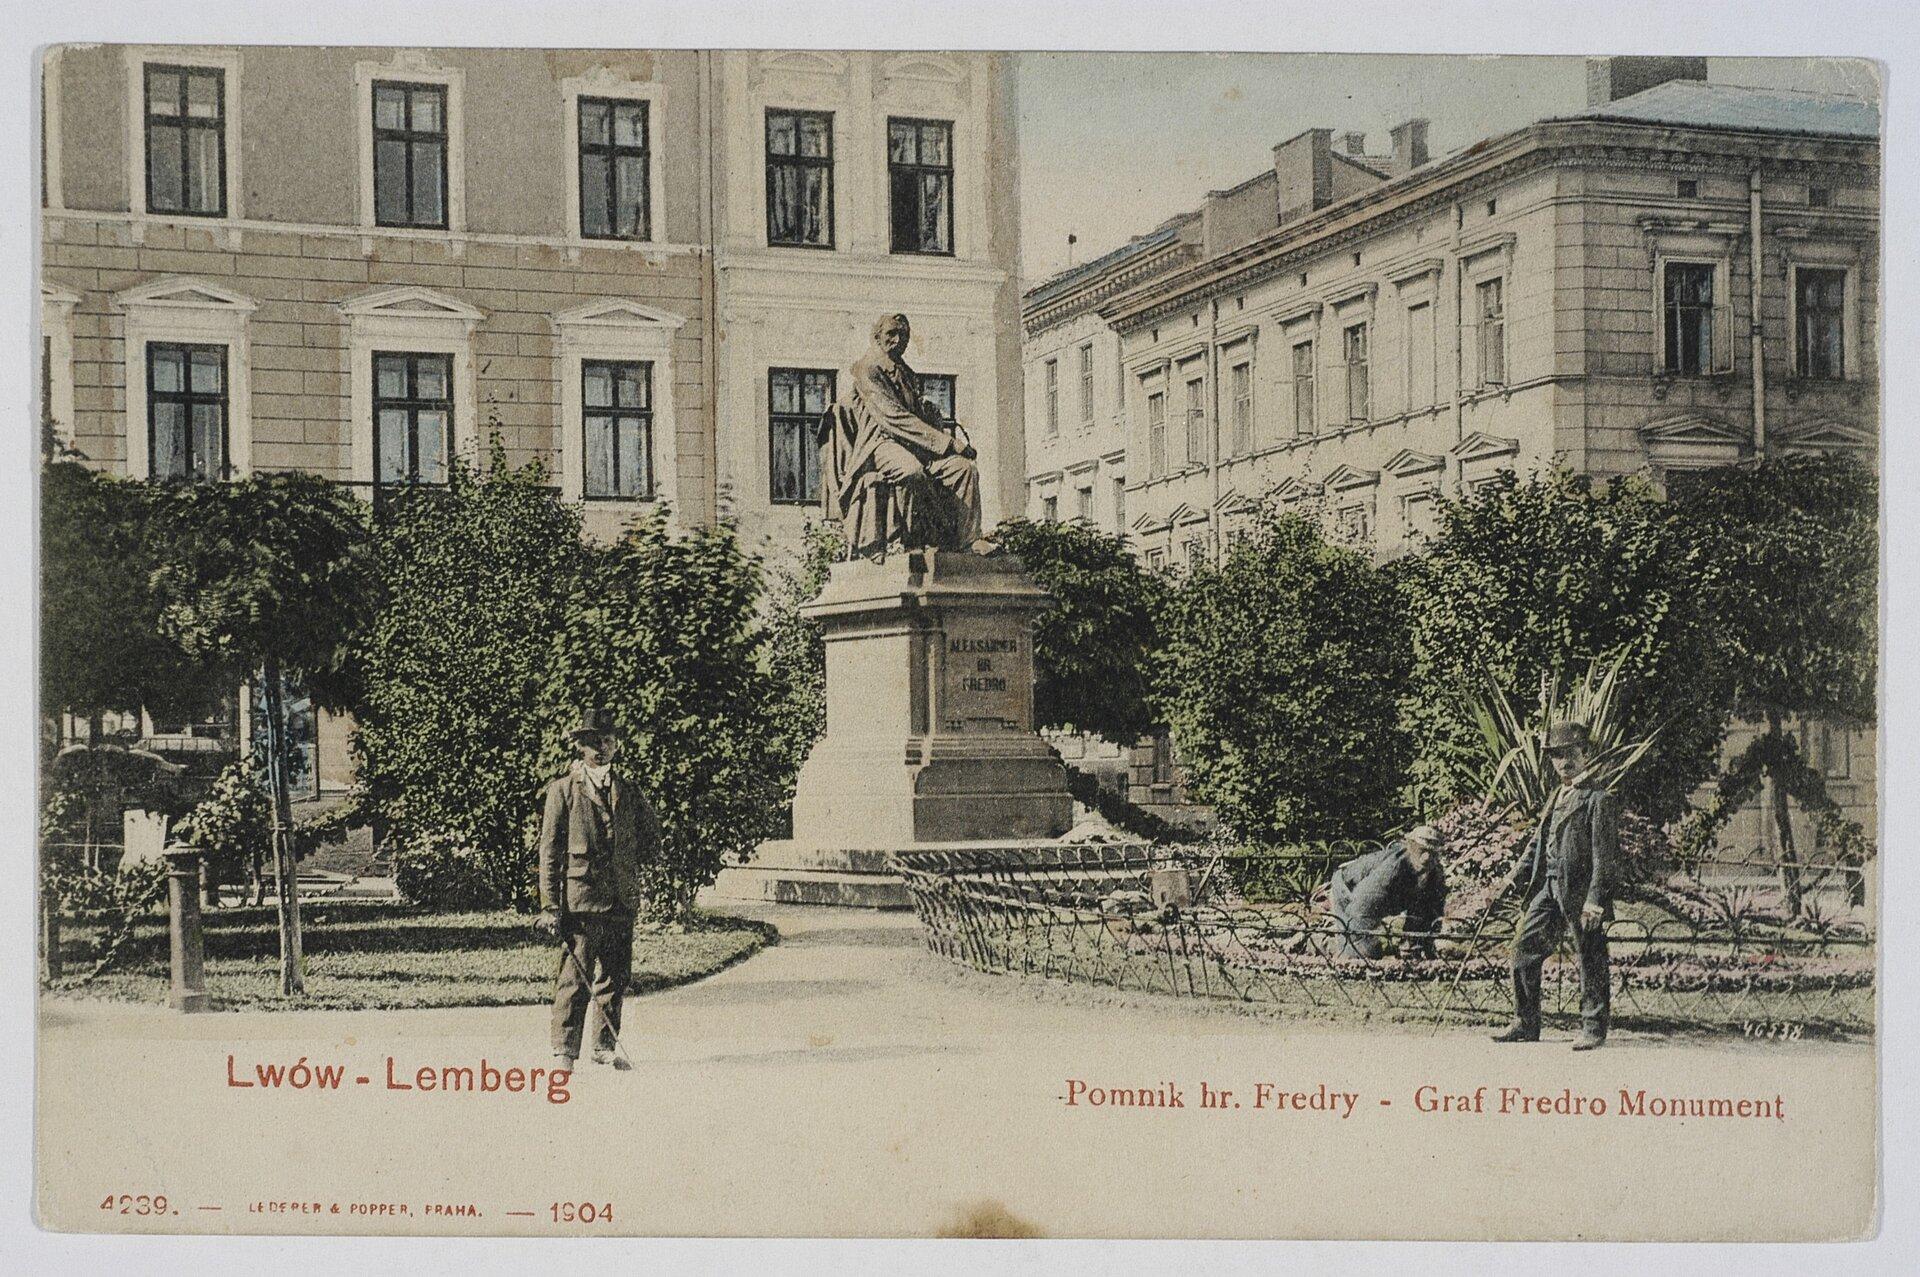 Leonard Marconi, Pomnik Aleksandra Fredry Leonard Marconi, Pomnik Aleksandra Fredry Źródło: Lwów 1904, pocztówka, domena publiczna.